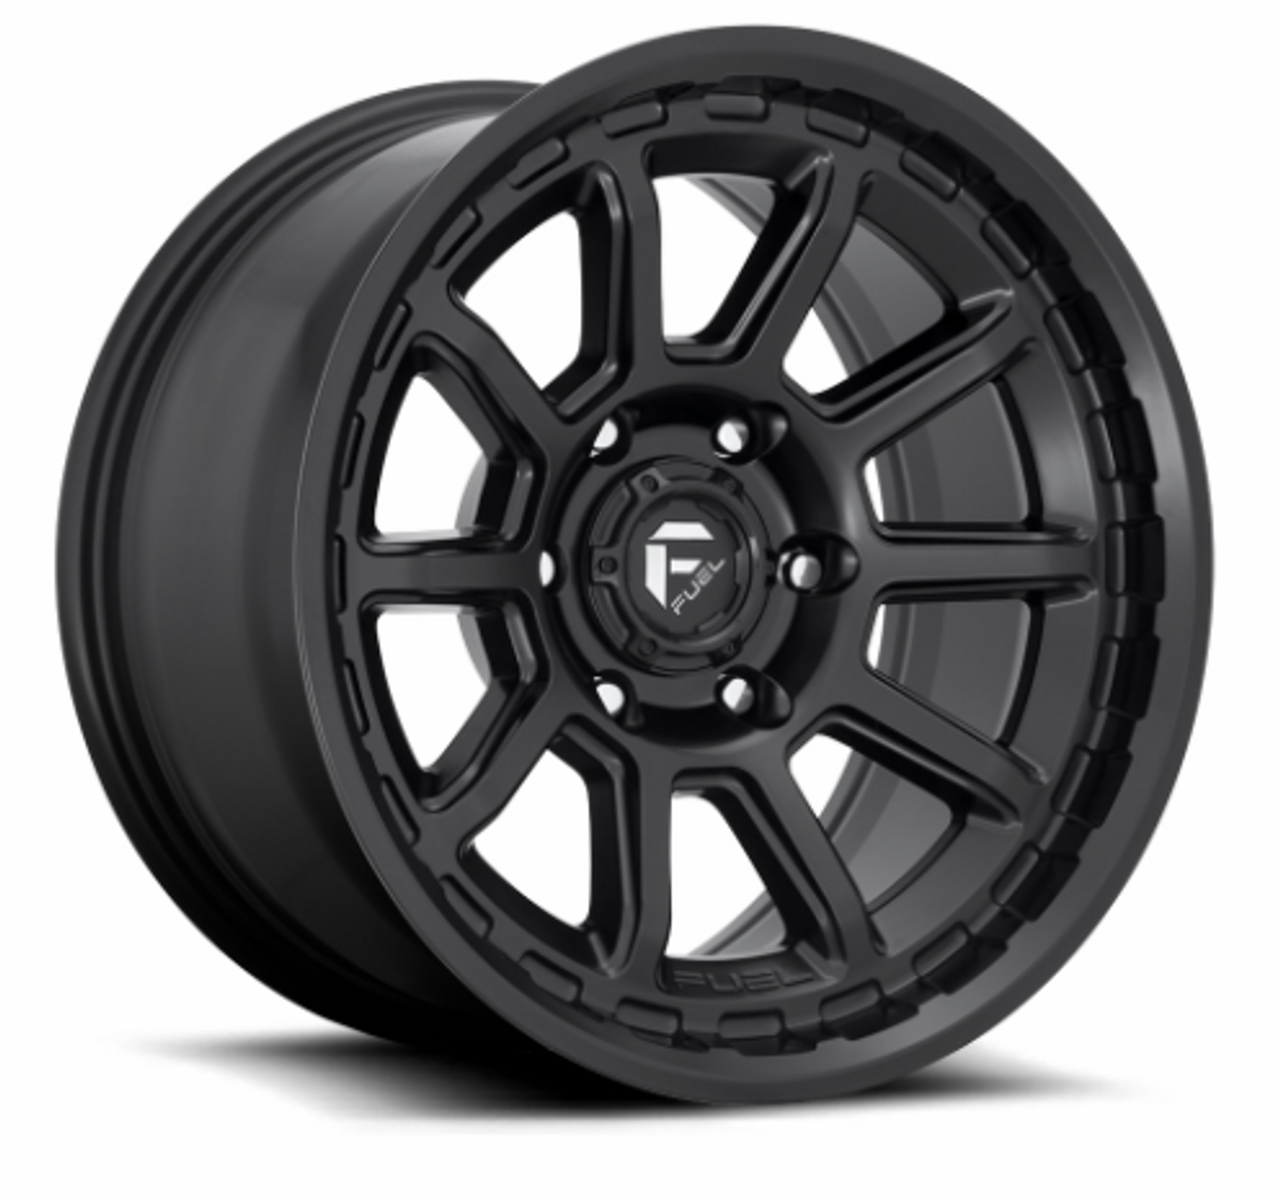 Fuel D68917907545 Torque Wheel 17x9 5x5 Matte Black